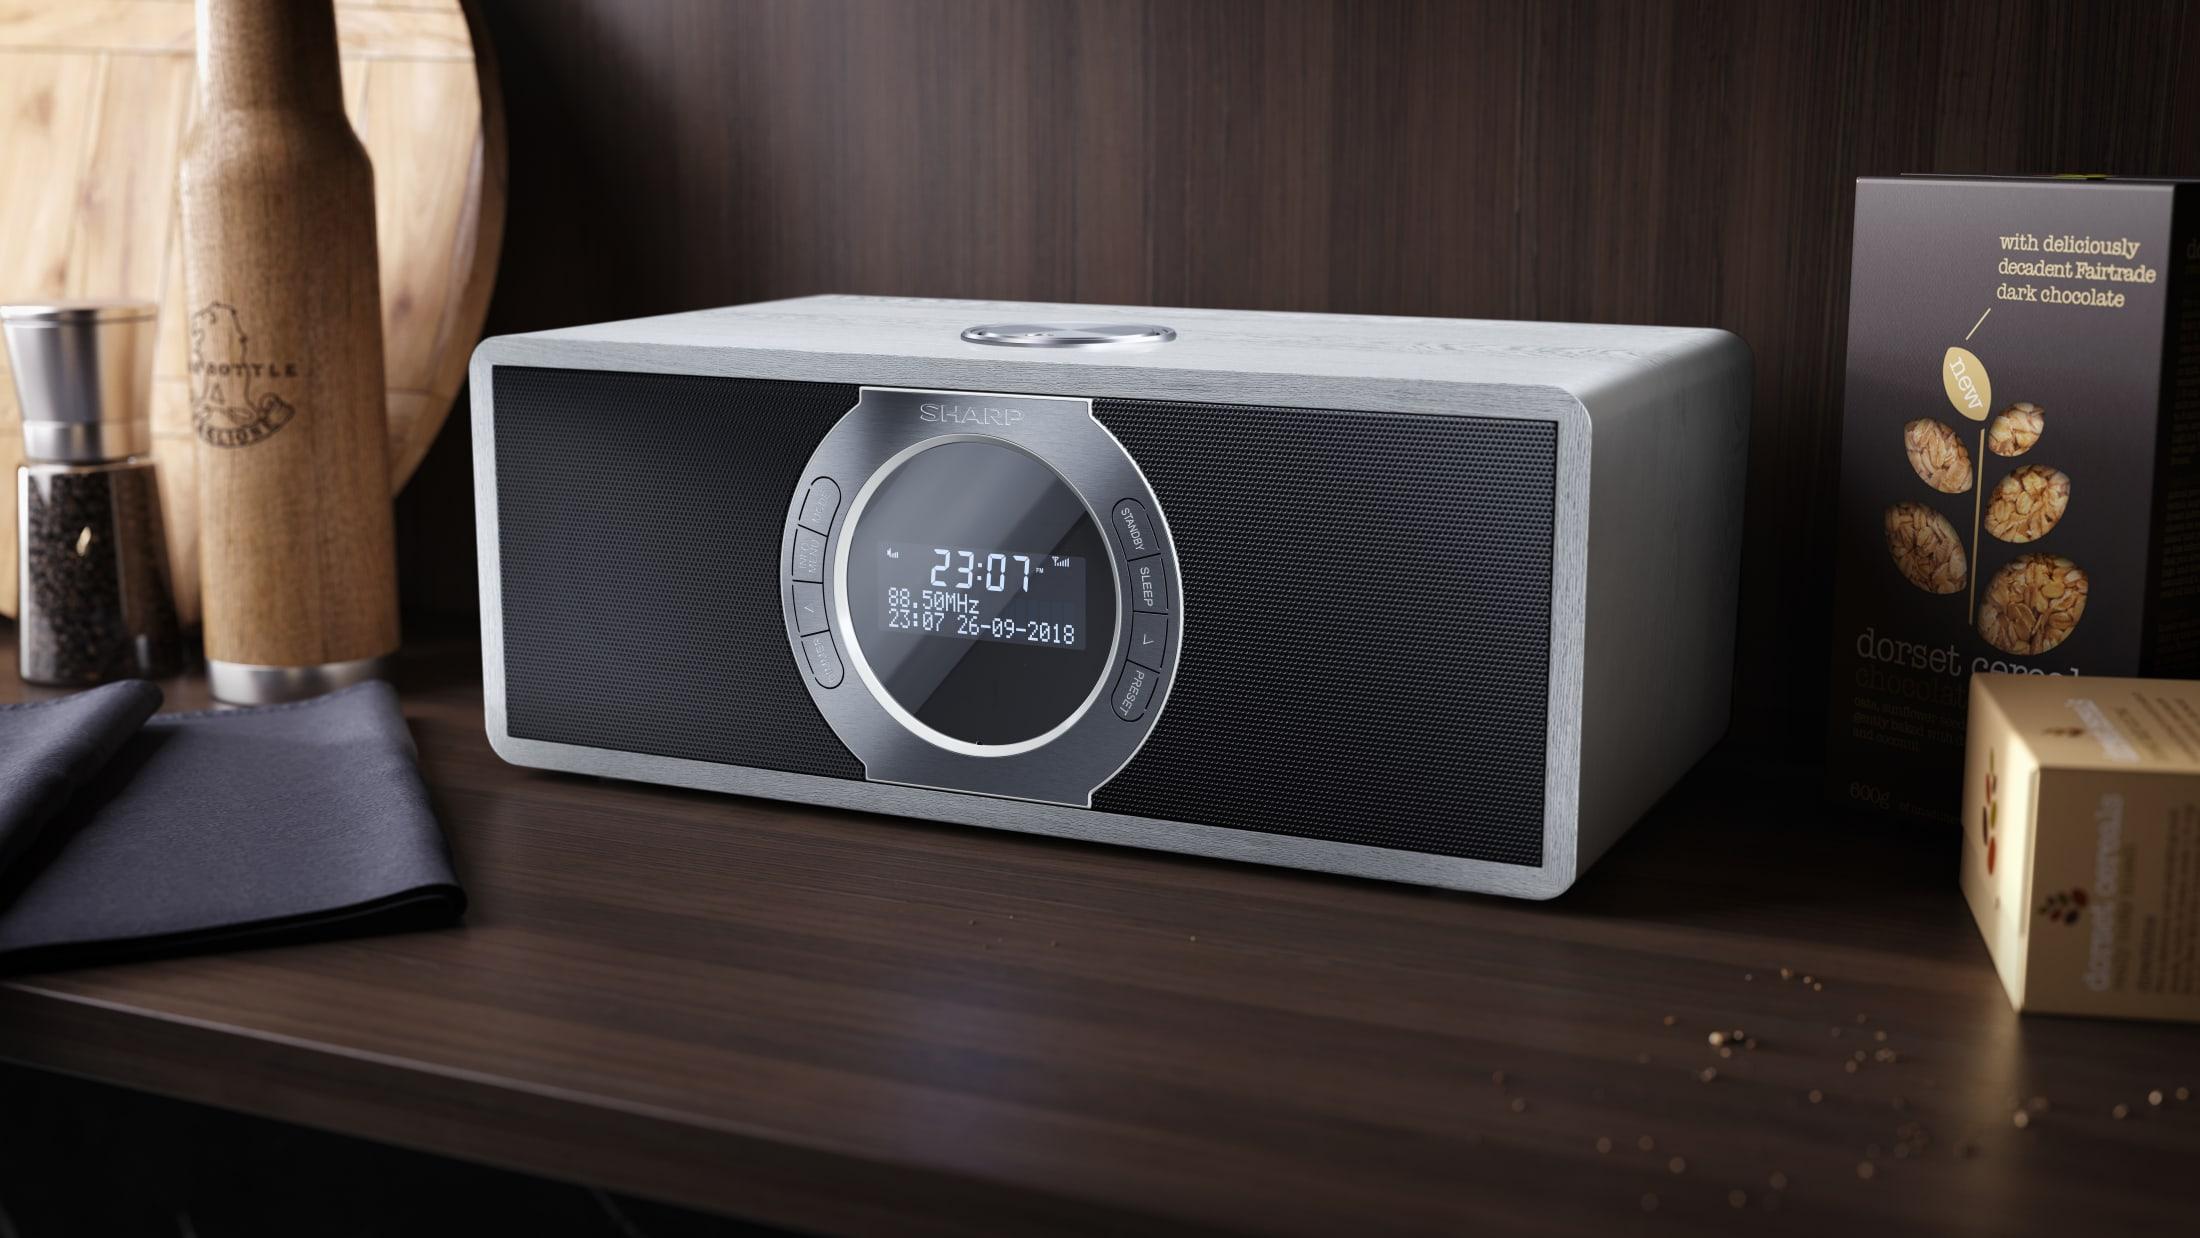 Stereo Digitalradio DAB/DAB+/FM with RDS, 30 W, Bluetooth 4.2 and 60 station memory.